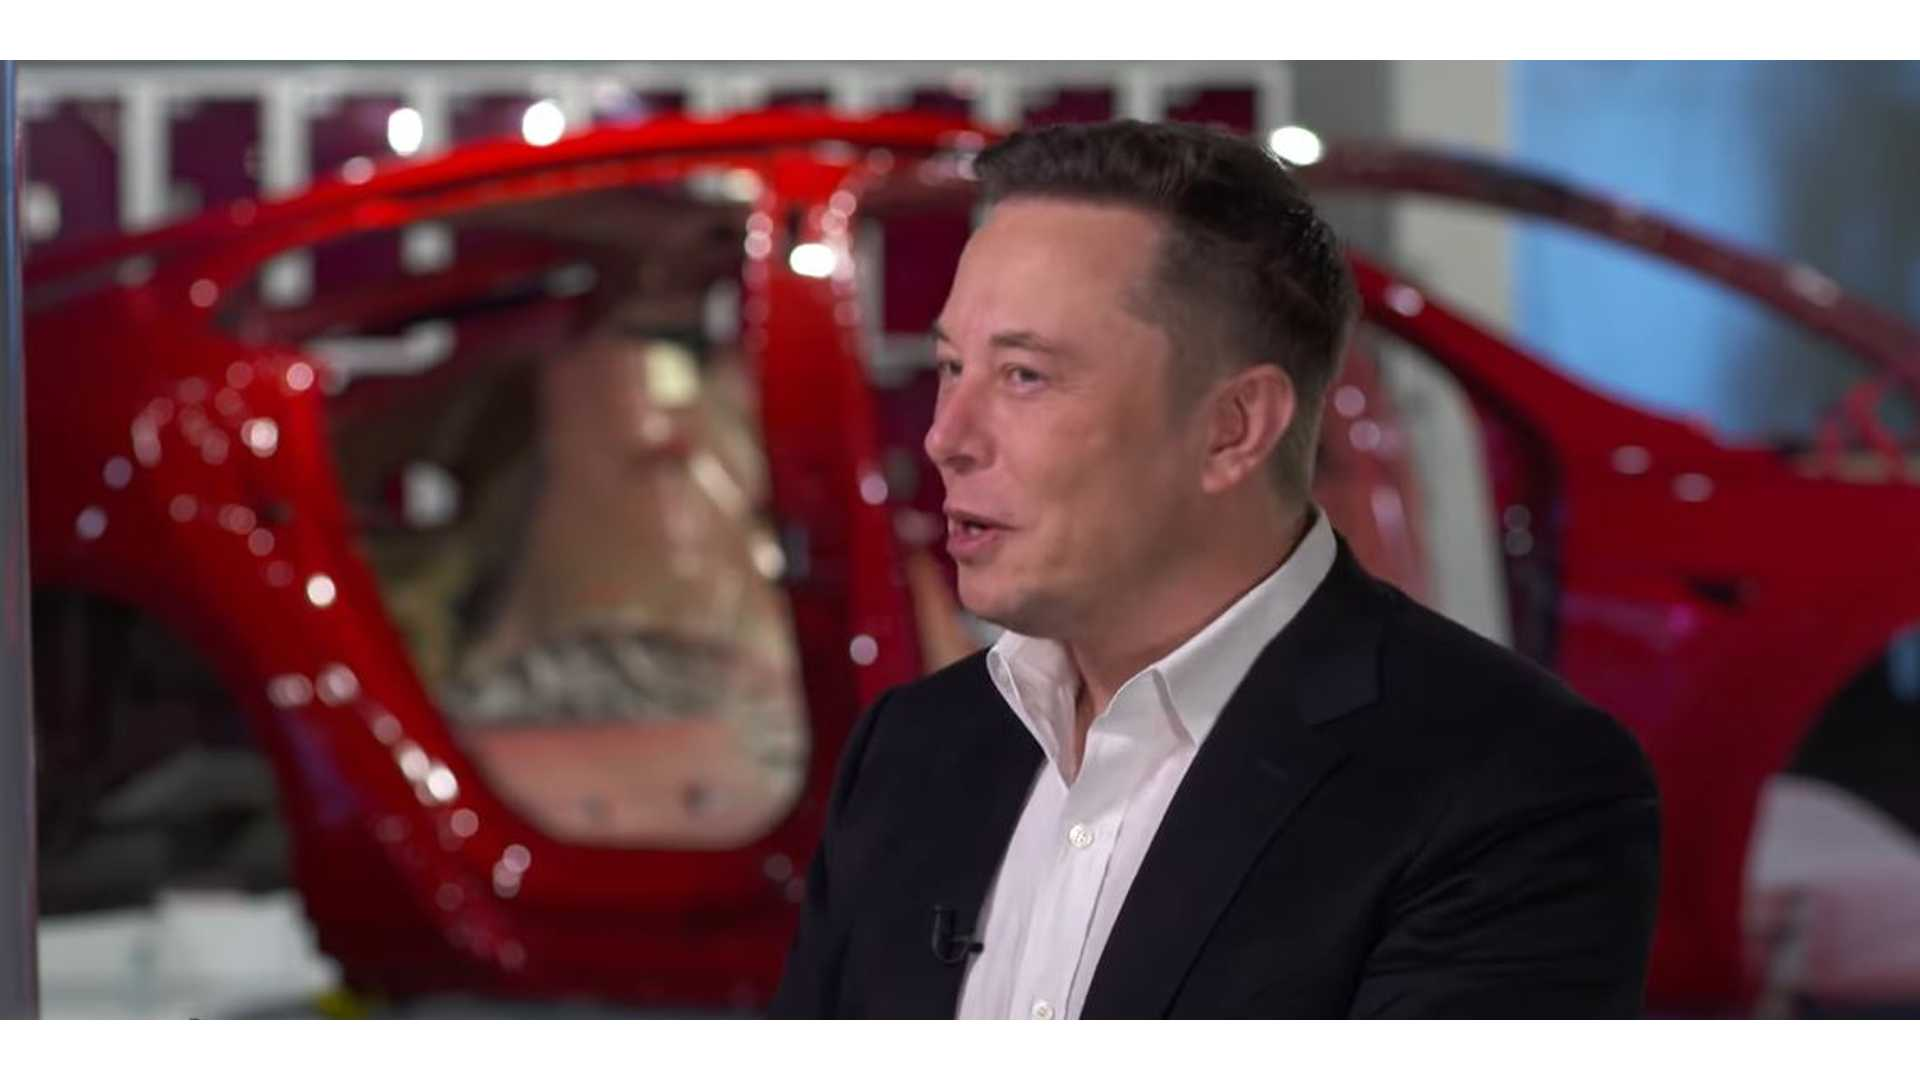 Elon Musk Faces Trial Over 'Pedo Guy' Tweet